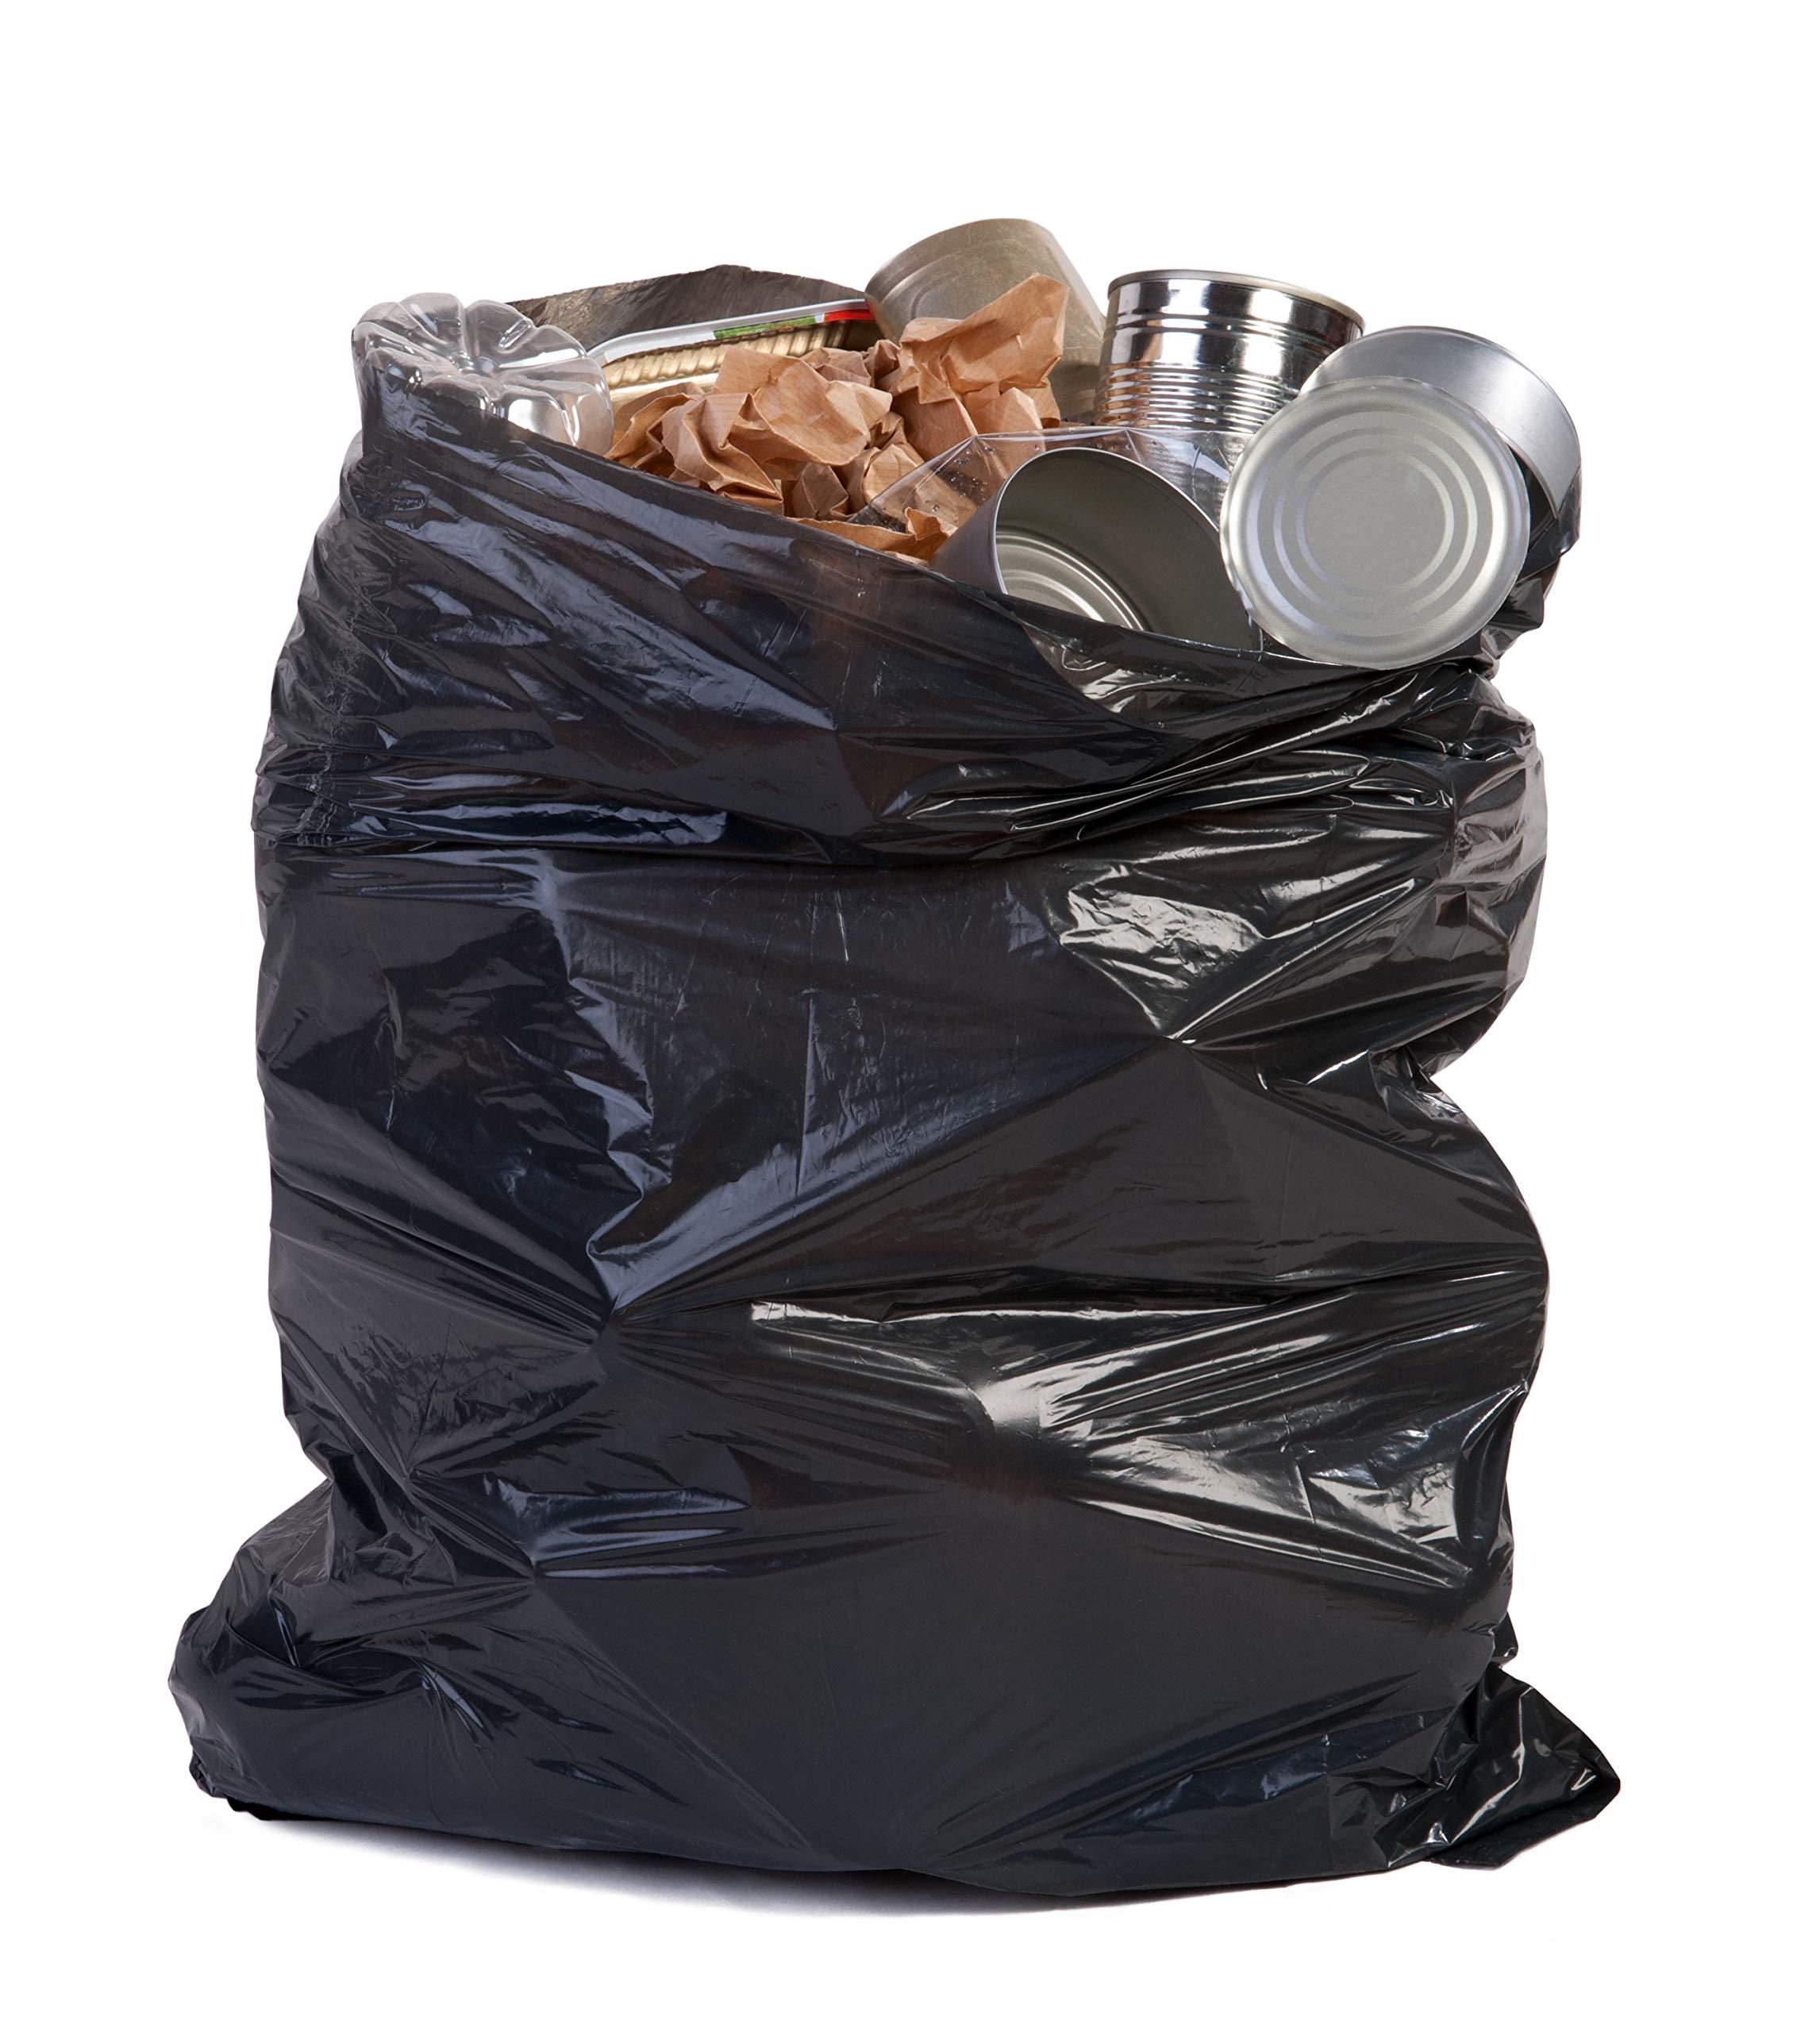 Toughbag 95 Gal Trash bags, Black, 2 Mil, 61x68, 25 Garbage Bags Per Case by ToughBag (Image #3)